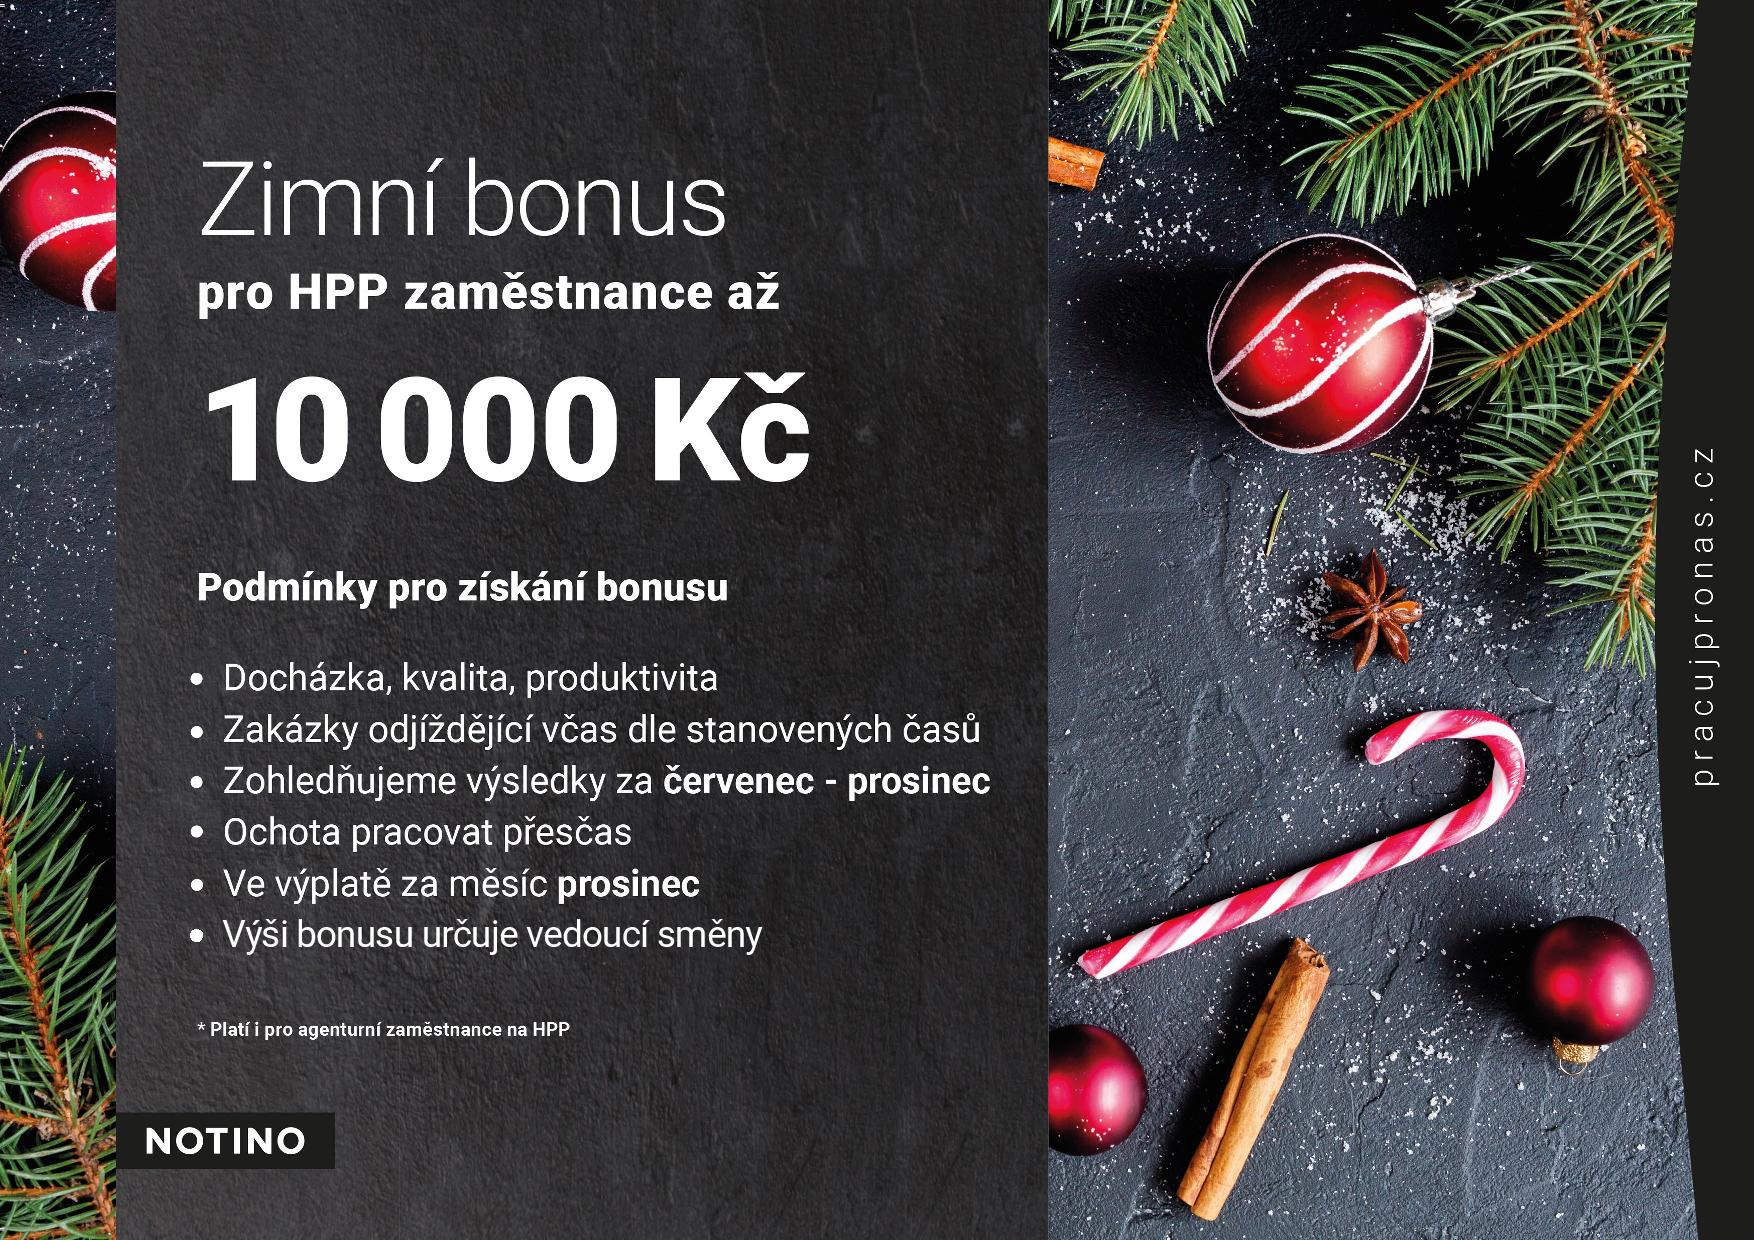 zimni bonus 2019_2-page-001